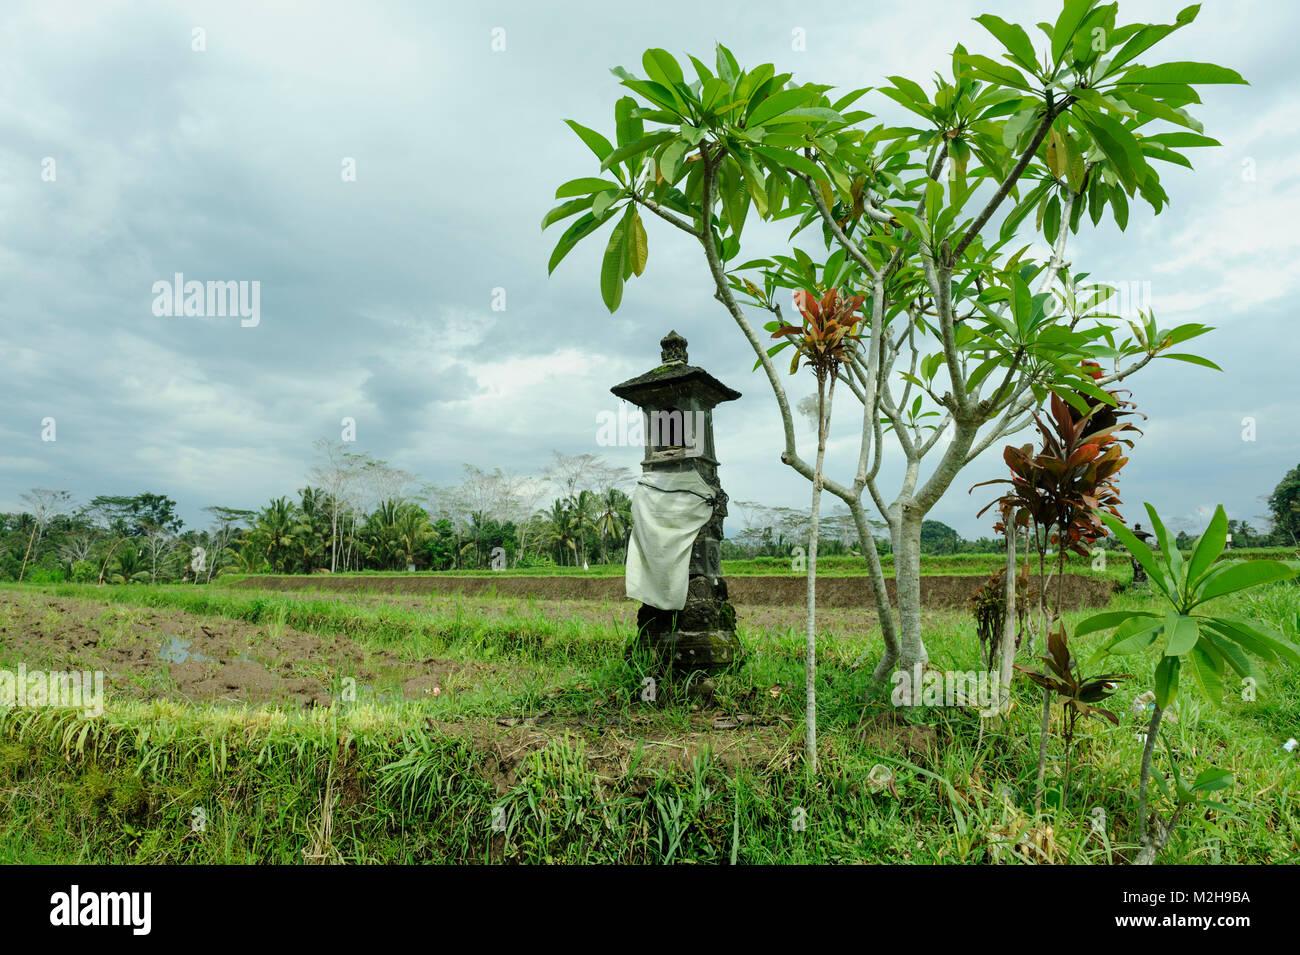 Small shrine or Sanggah Ulun Carik in rice fields near Ubud, Bali, Indonesia Stock Photo